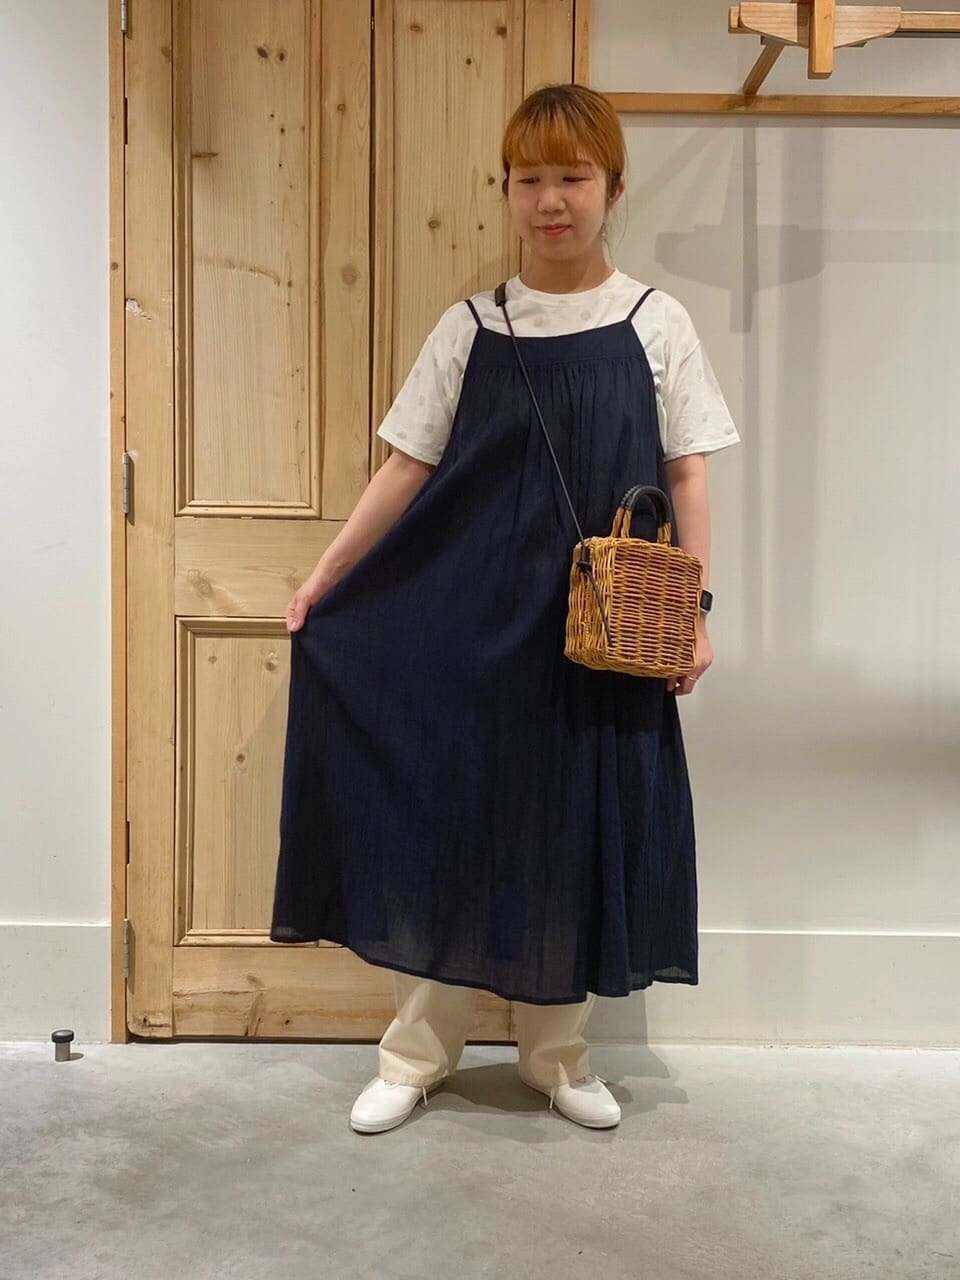 Malle chambre de charme 調布パルコ 身長:155cm 2021.07.19